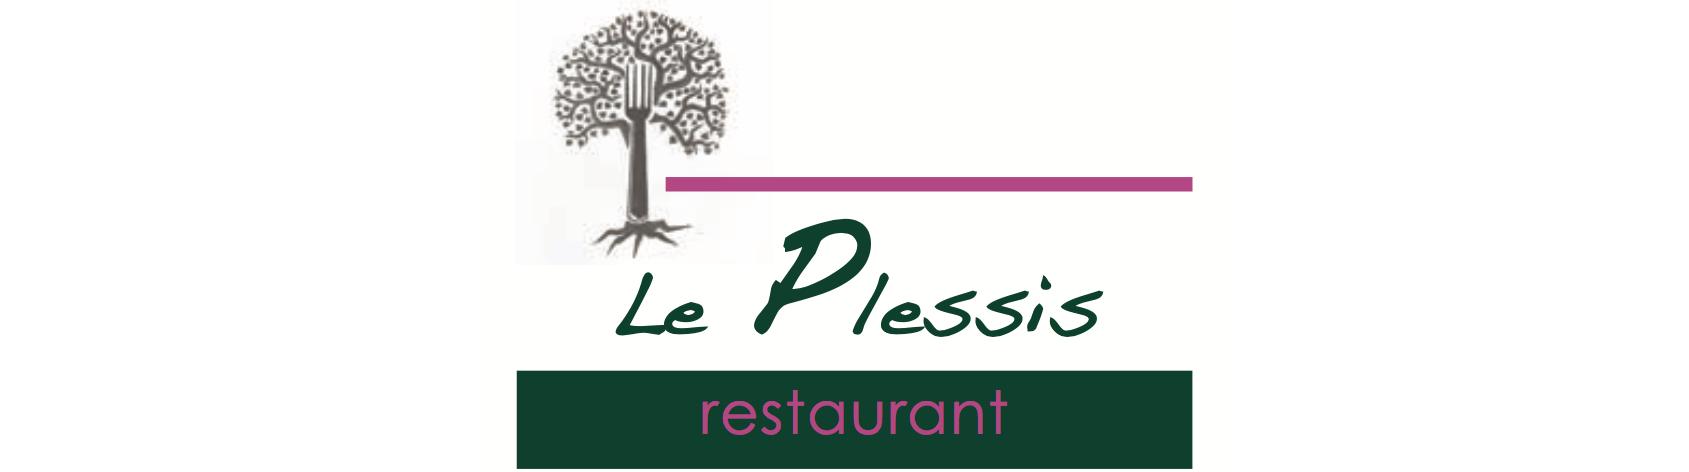 Logo Le Plessis